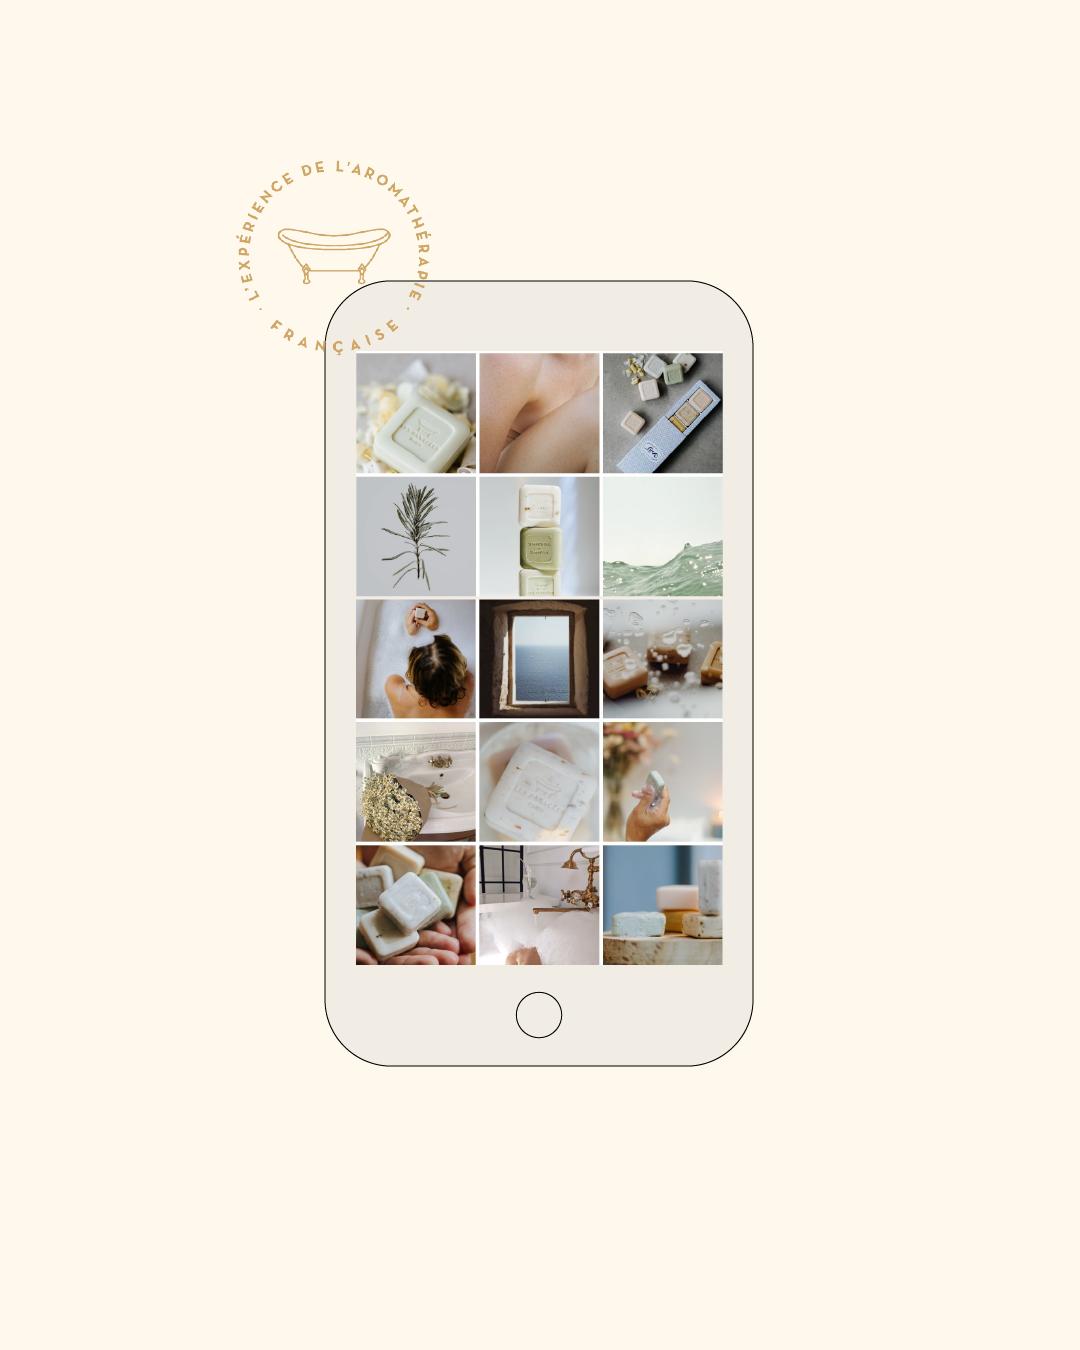 melodydursun-lespanacees-communication-socialmedia-feed-1